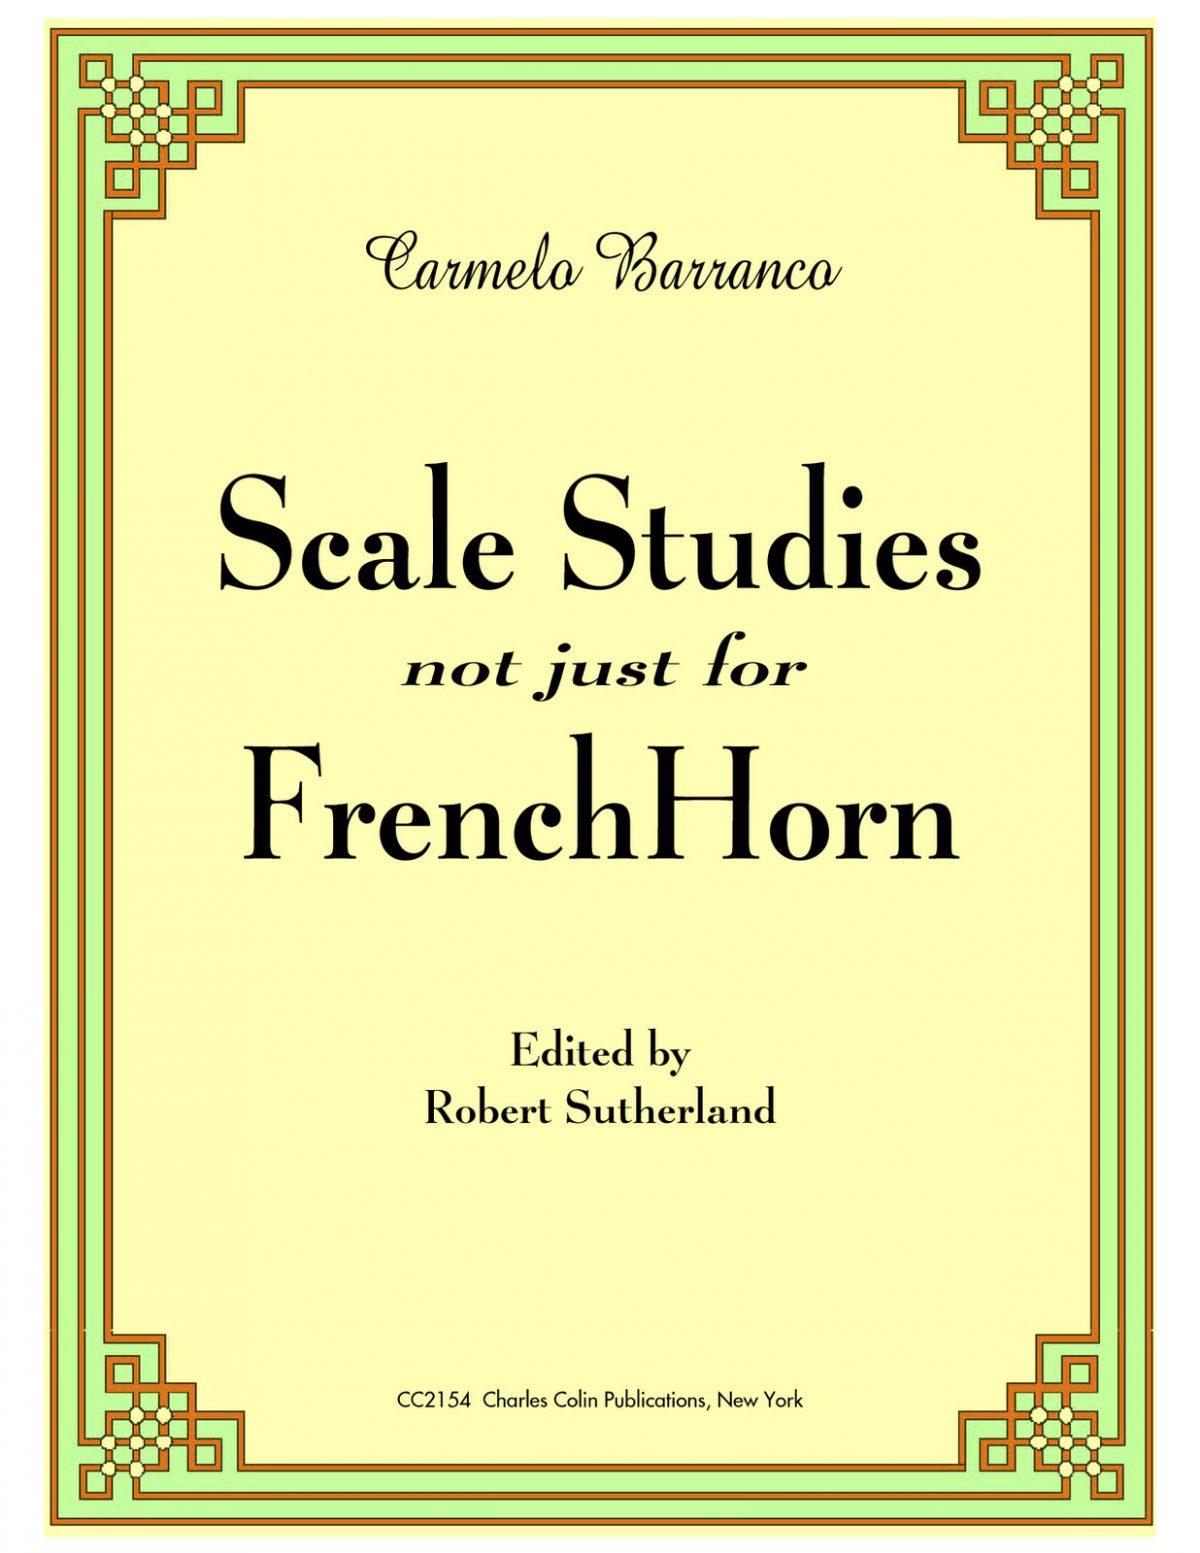 Barranco, Scale Studies